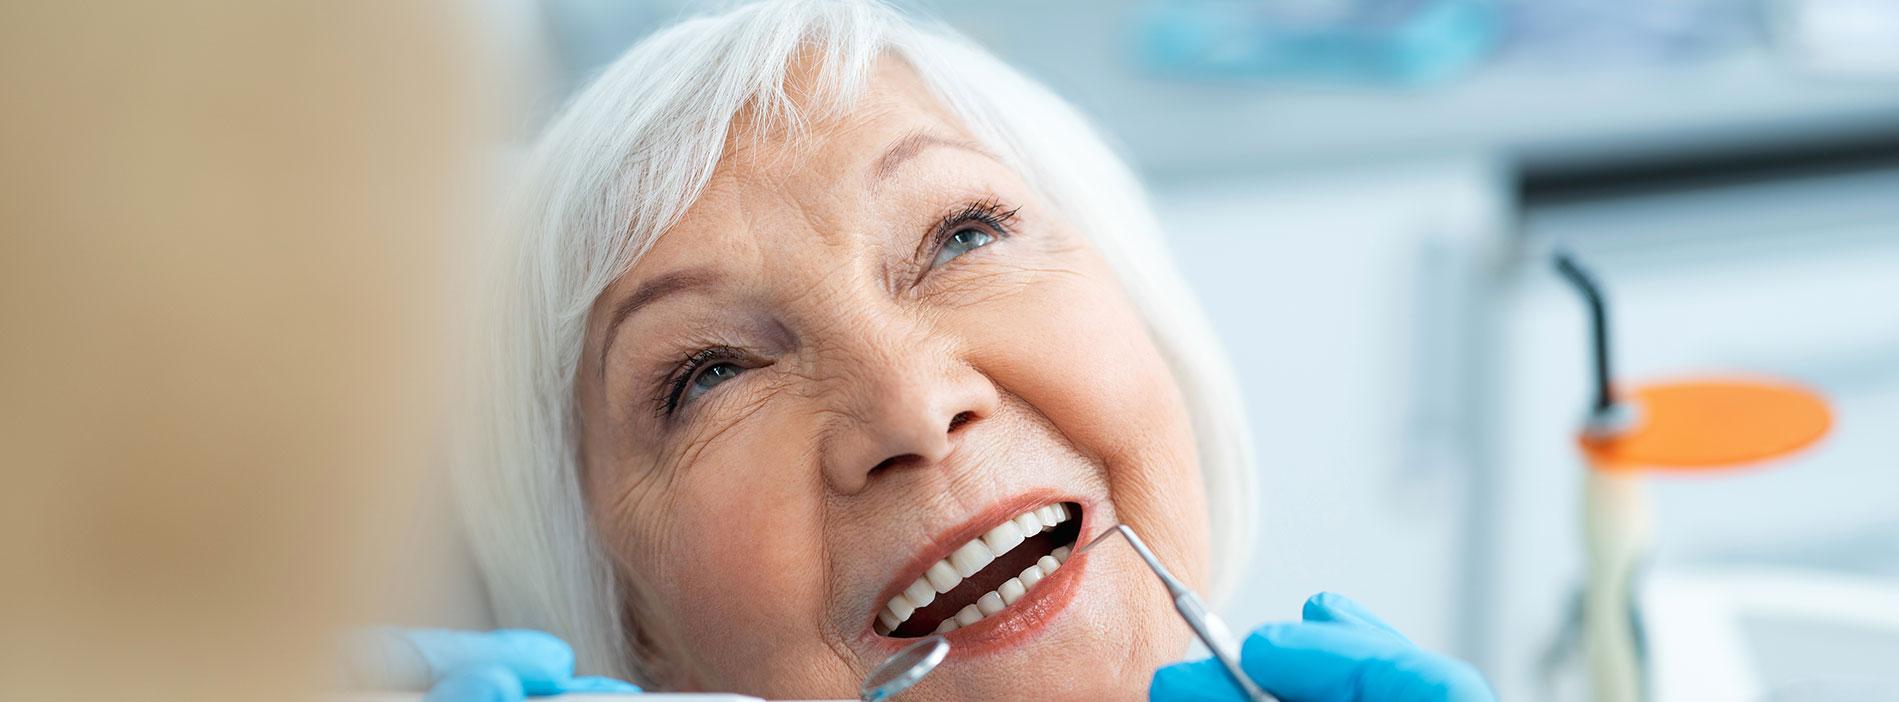 Senior woman smiling with dentures